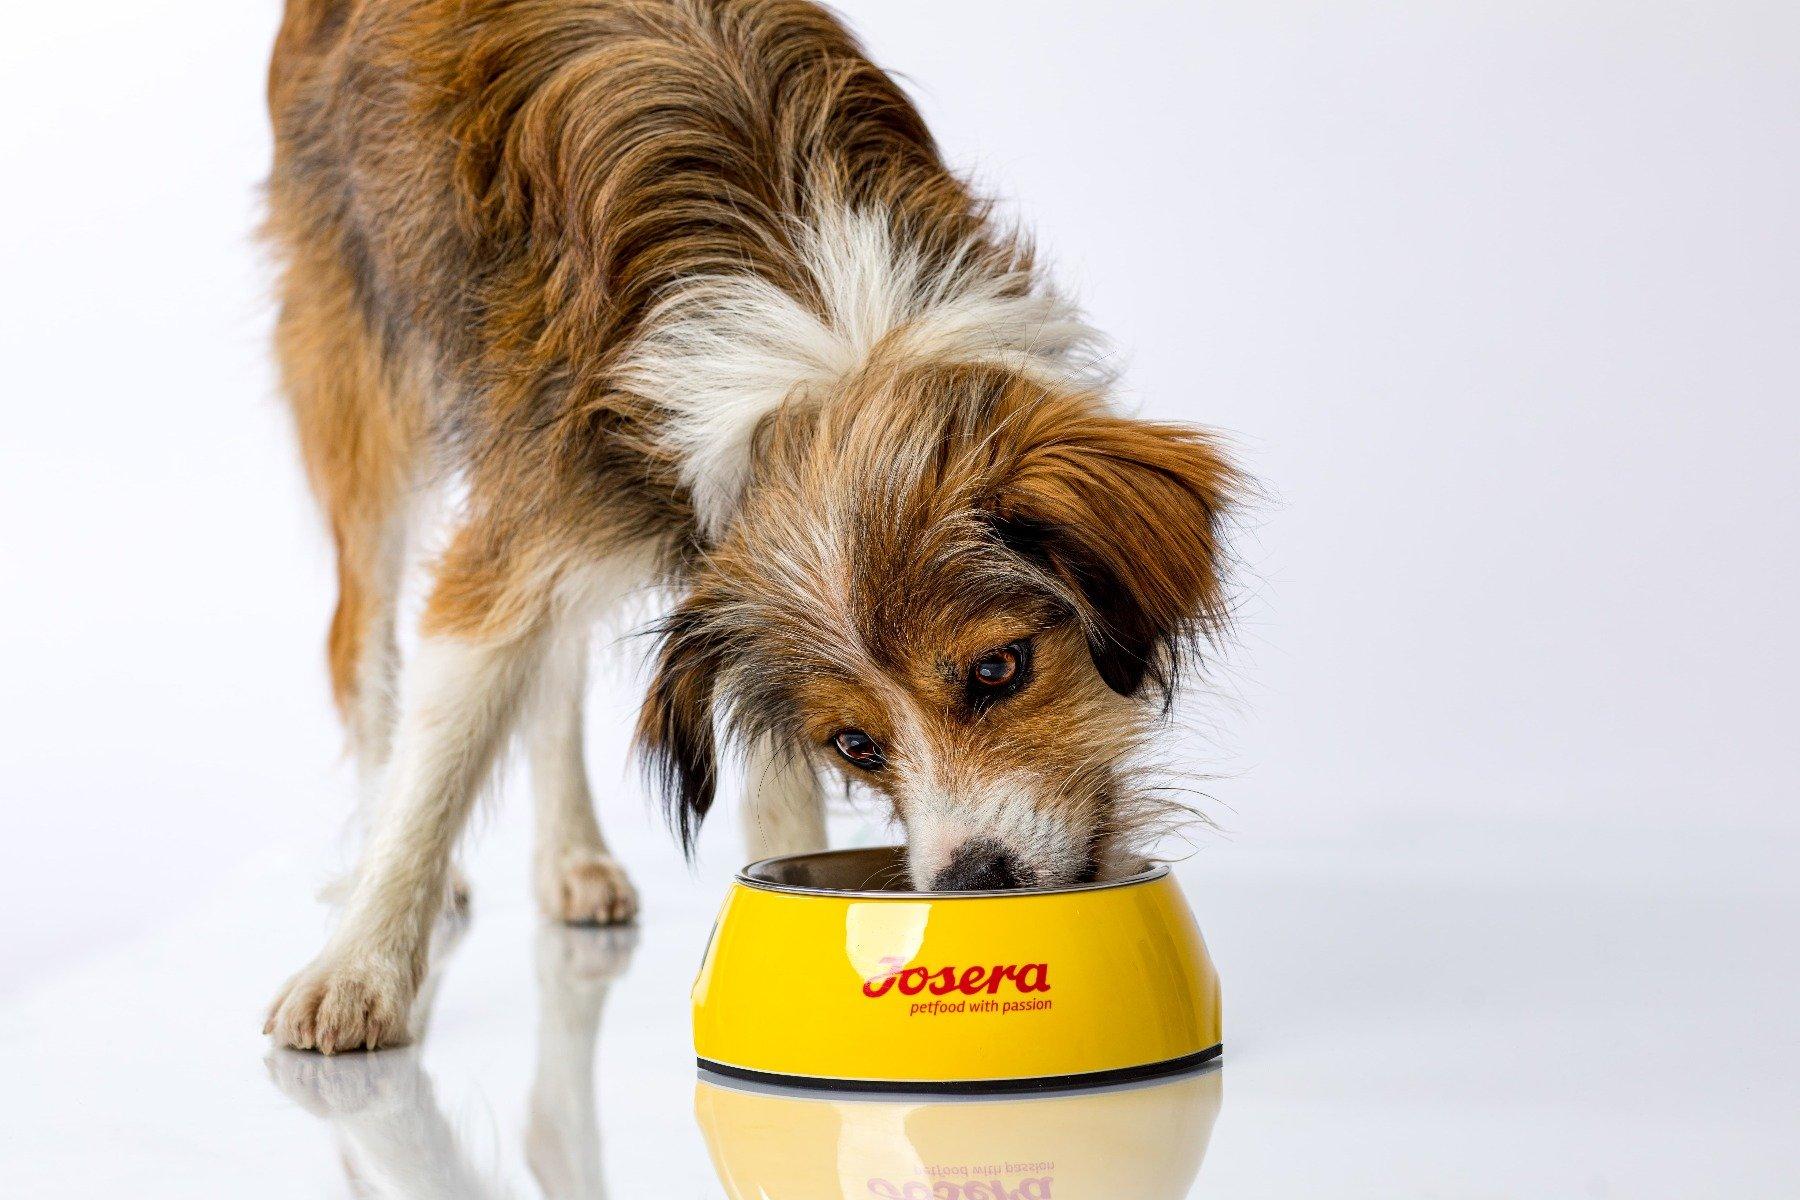 Hund mit Josera-Napf